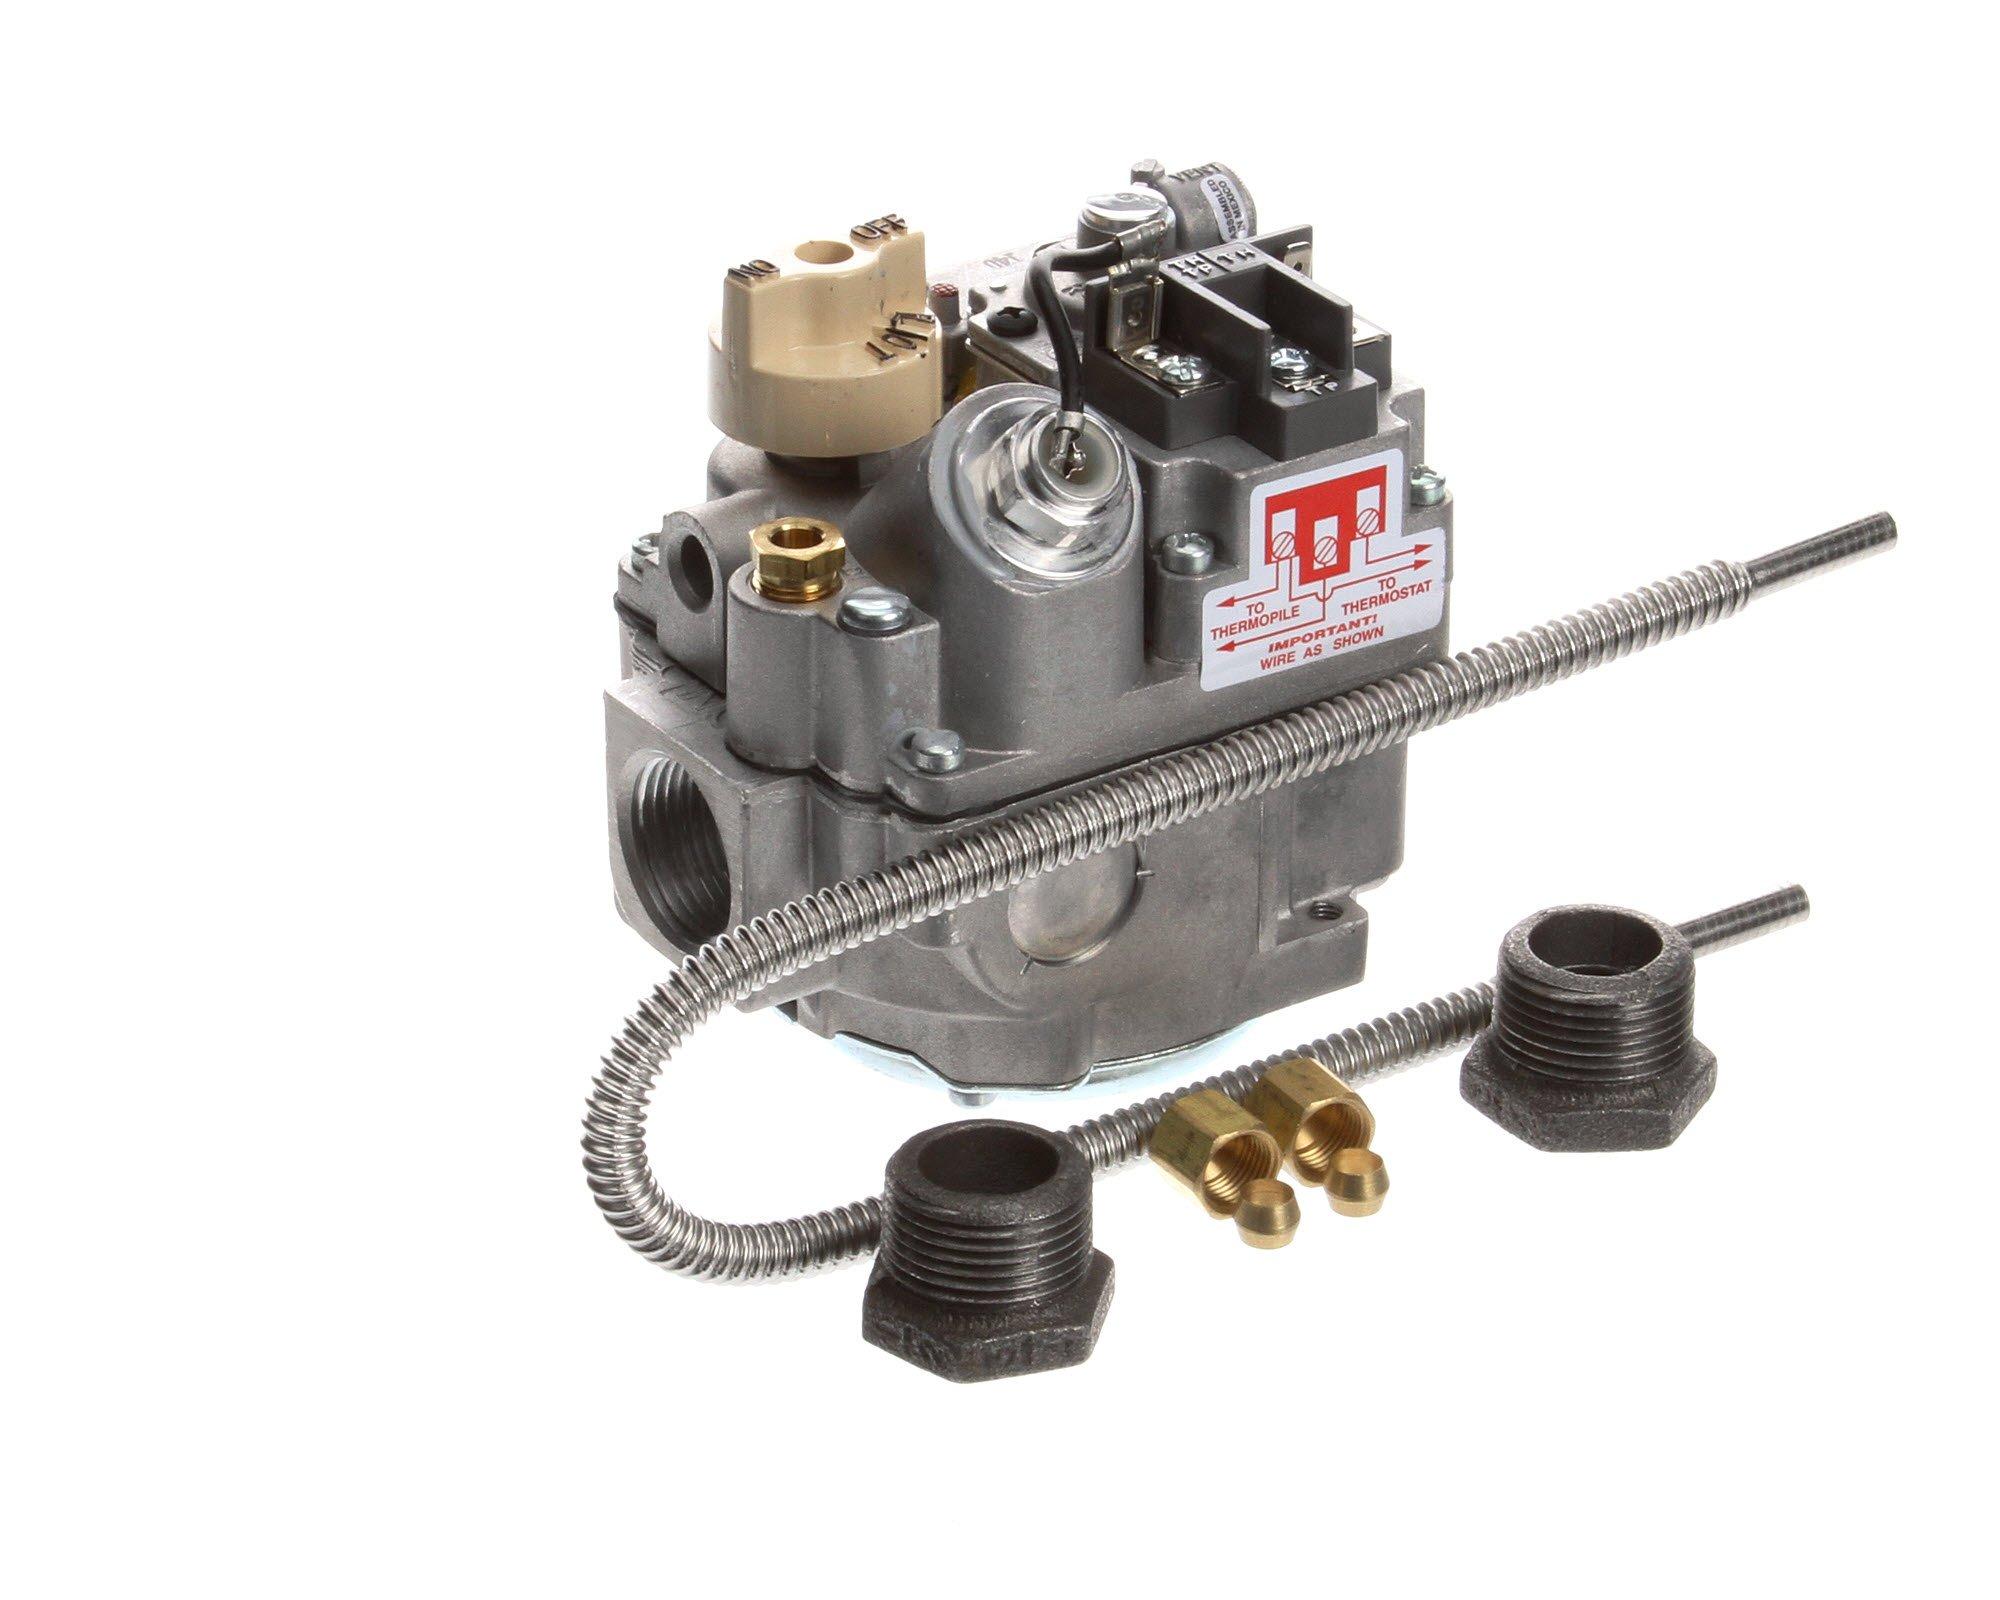 Imperial 37560, Ifs-40 Fryer Gas Valve NAT